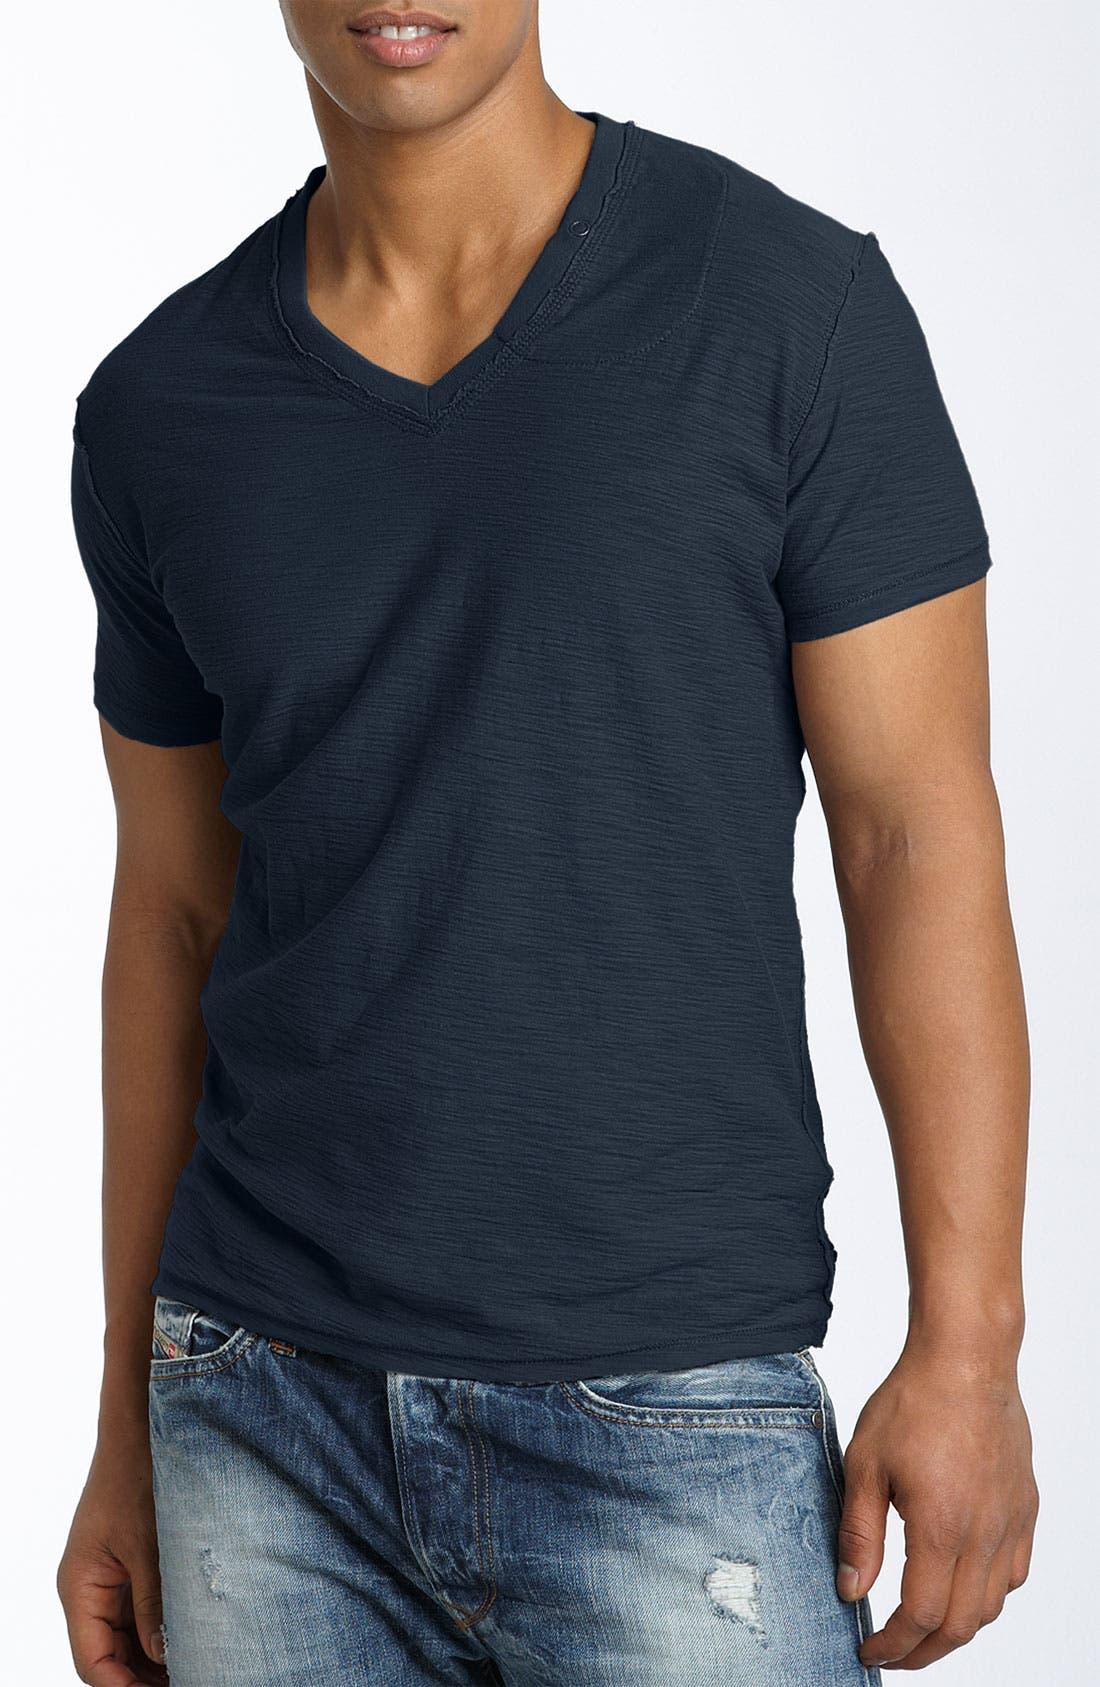 Alternate Image 1 Selected - DIESEL® 'TOS' Extra Trim Fit V-Neck Slub T-Shirt